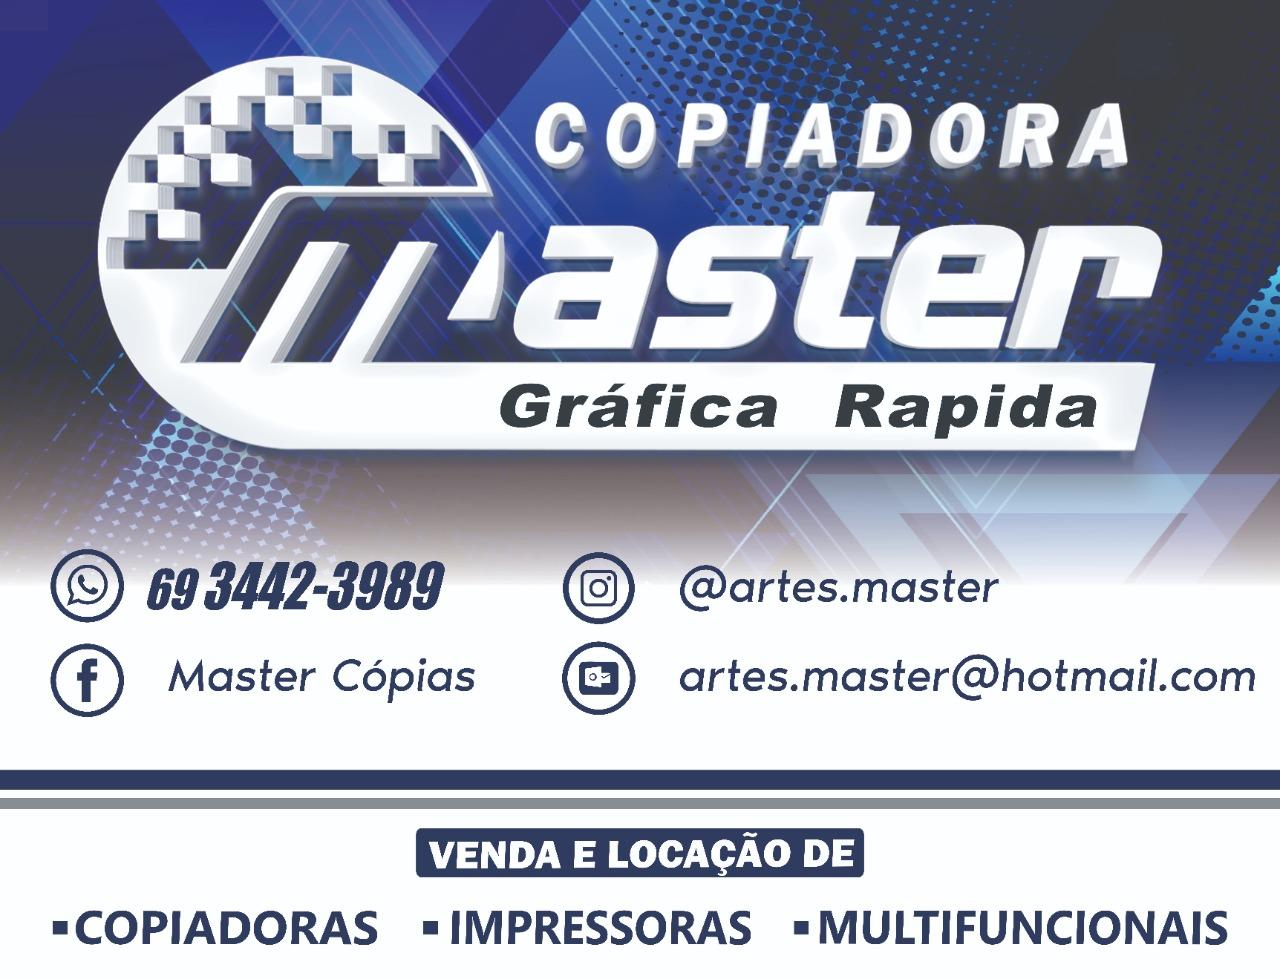 Master Cópias